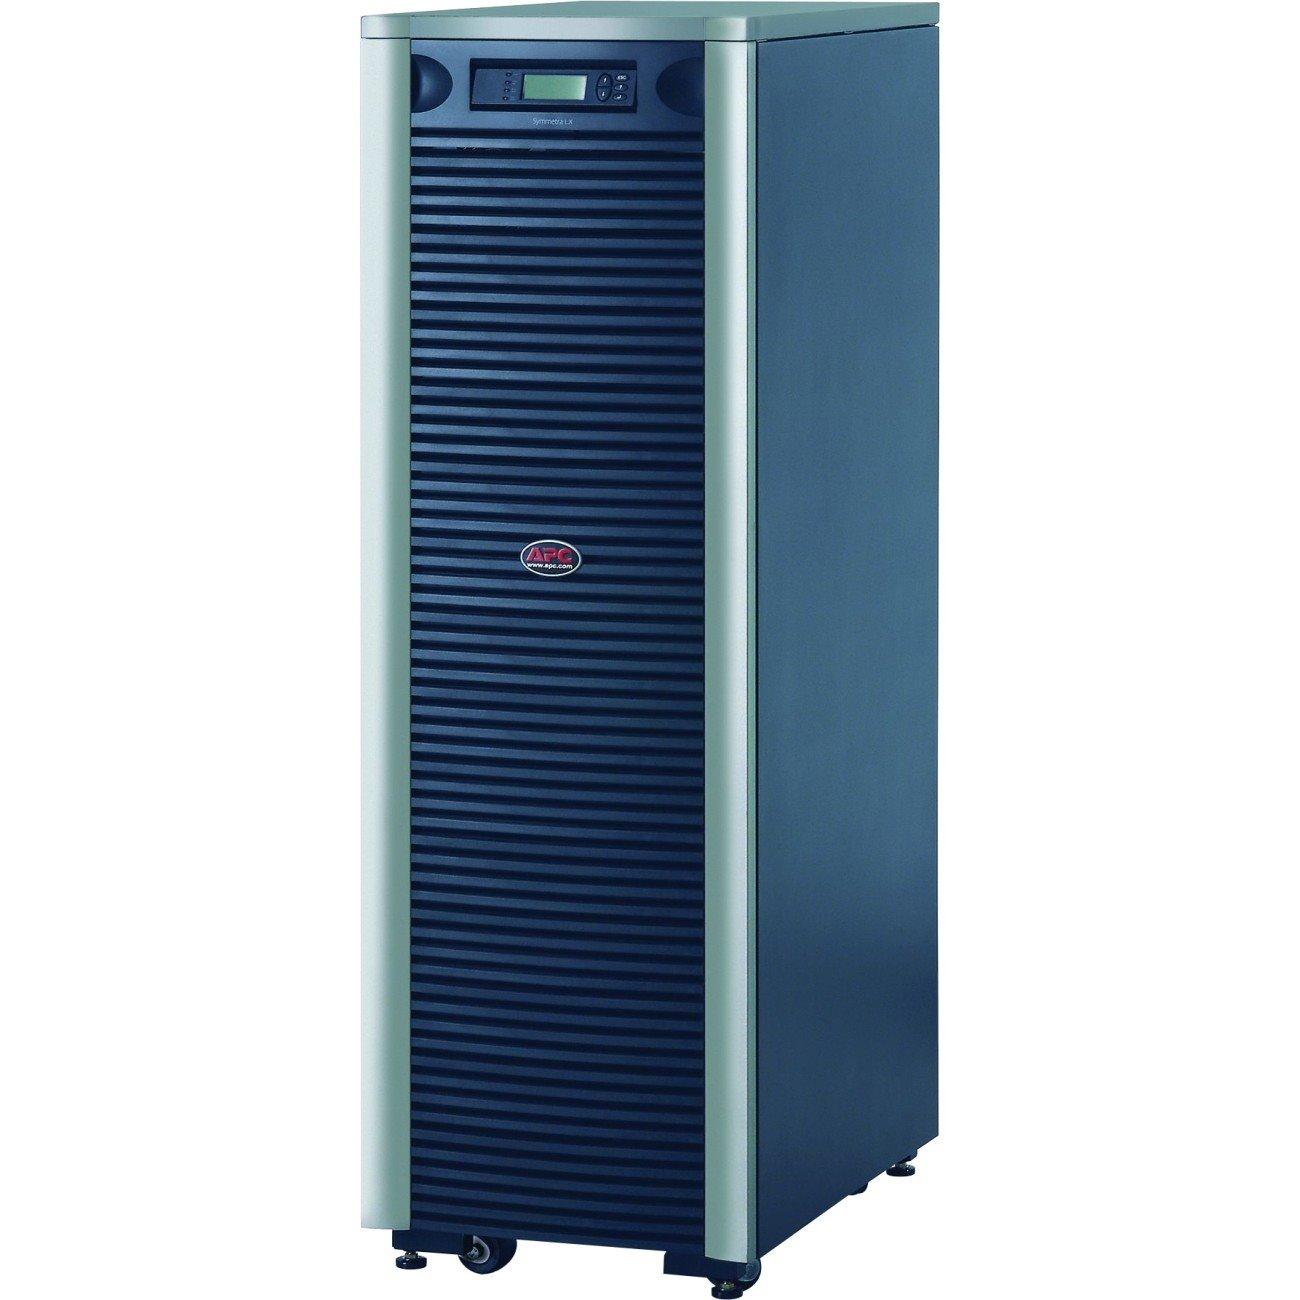 APC by Schneider Electric Symmetra SYA16K16IXR Dual Conversion Online UPS